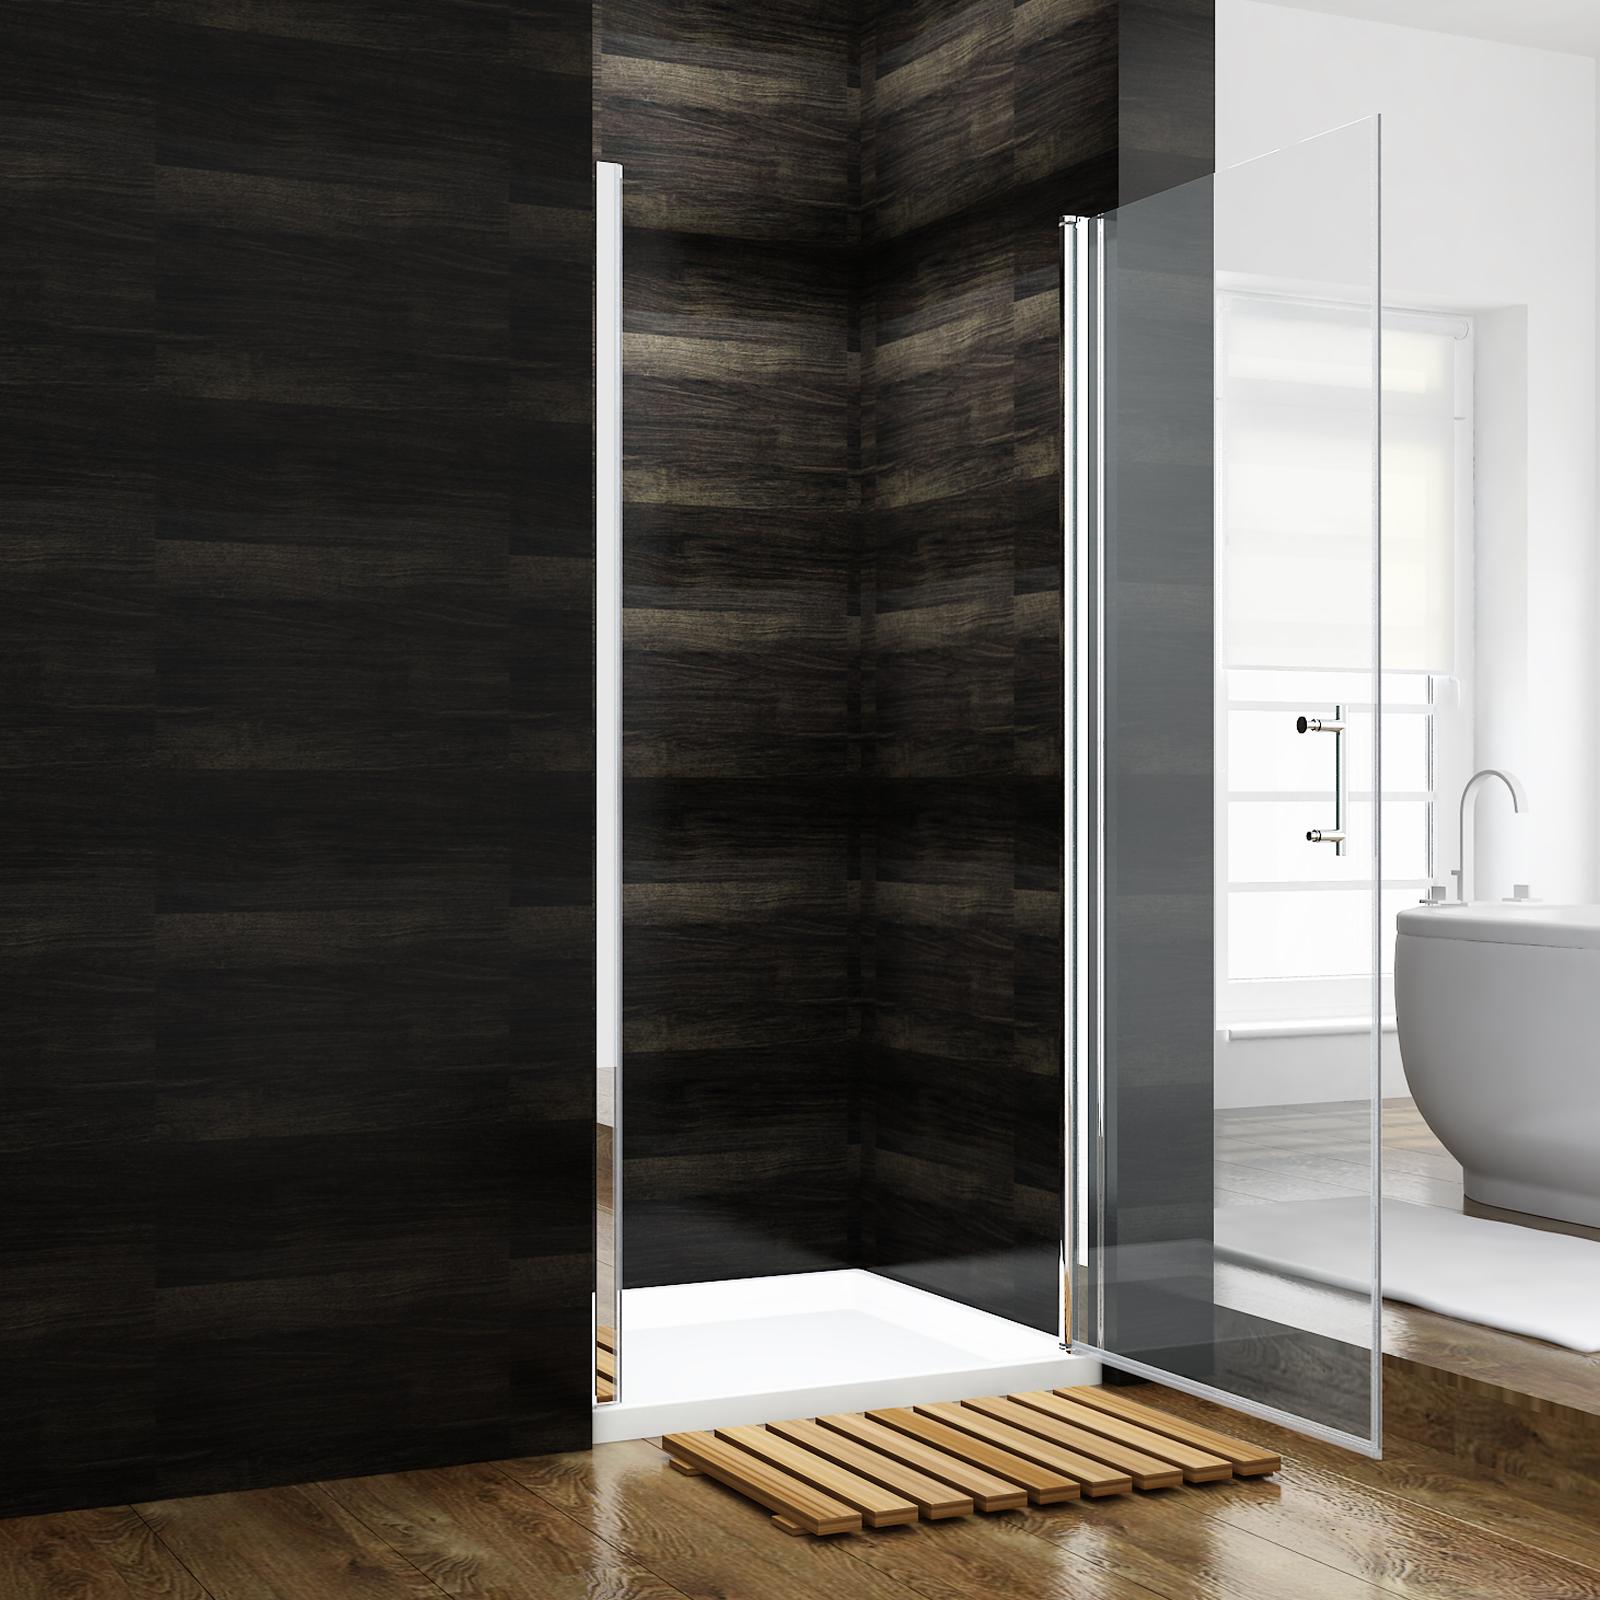 artikelmerkmale - Dusche Pendeltur Schwingtur